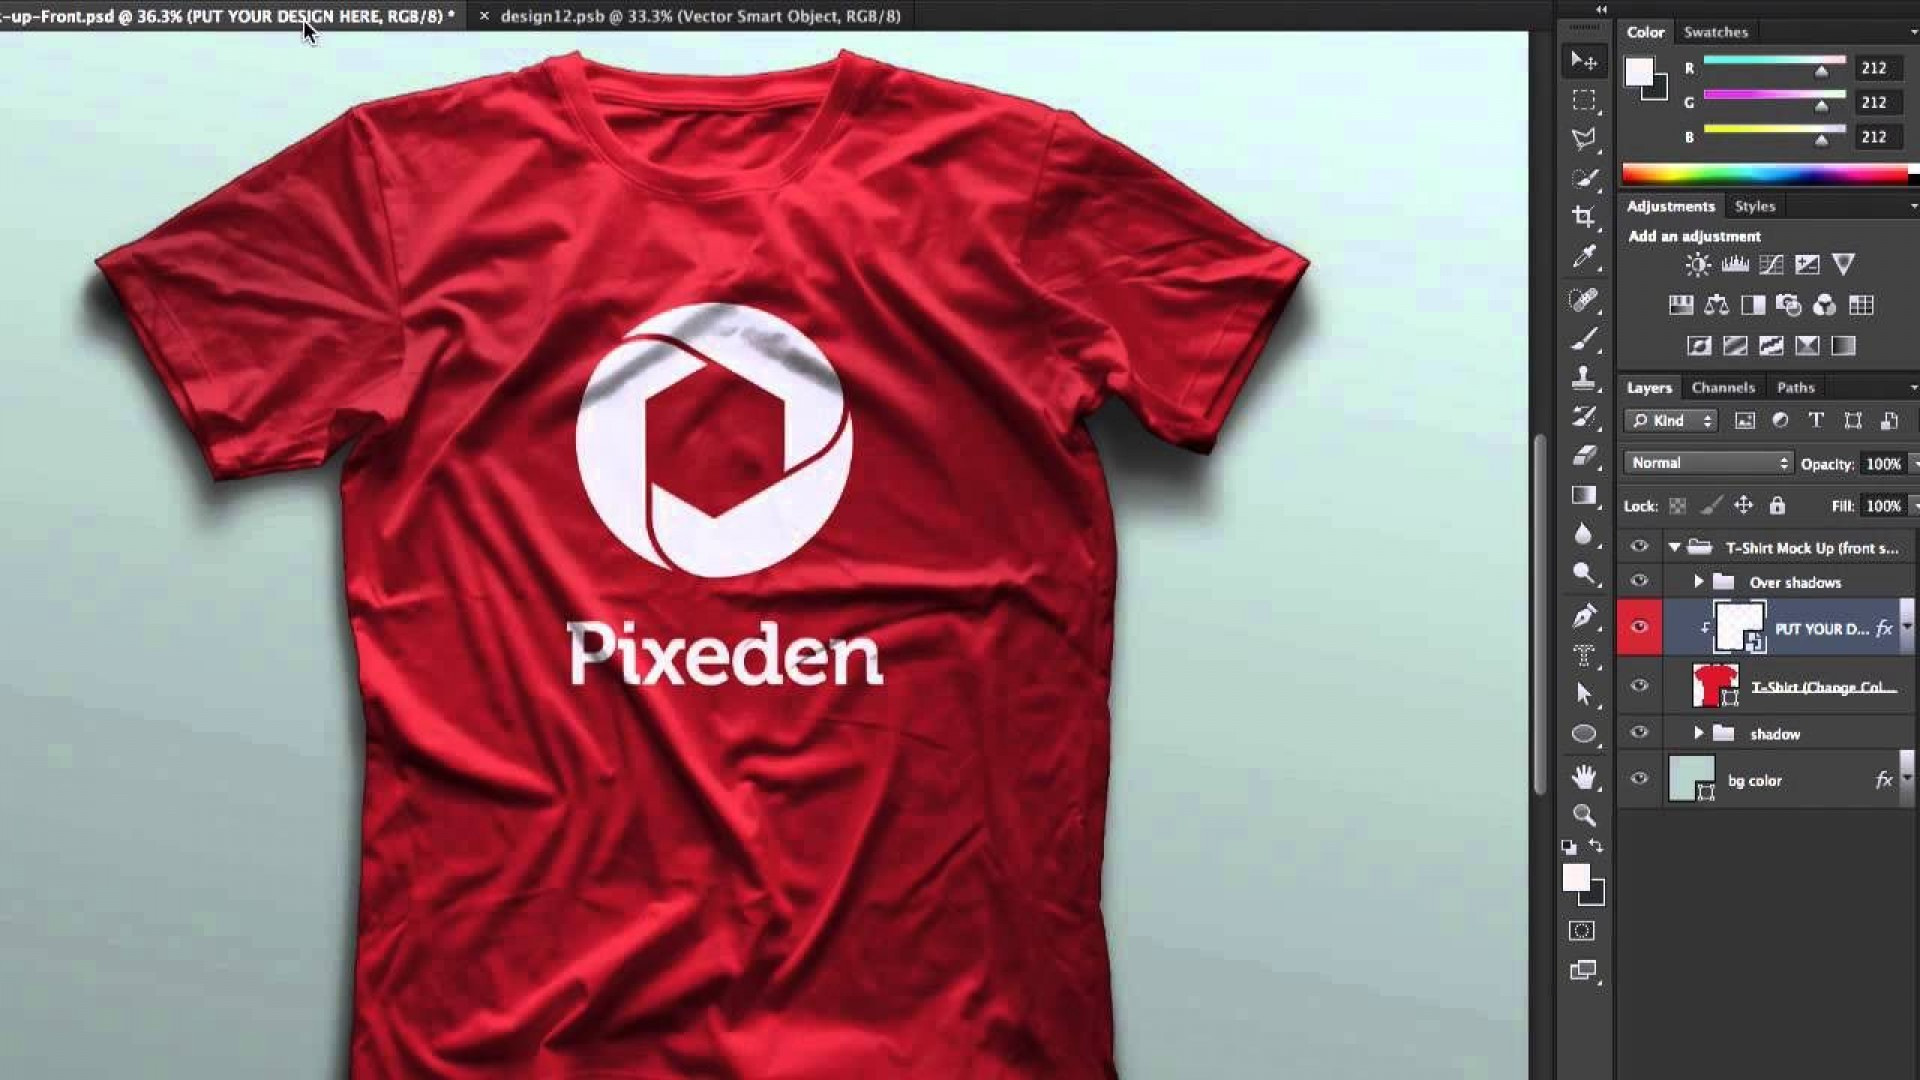 005 Wonderful T Shirt Design Template Psd Inspiration  Blank T-shirt Free Download Layout Photoshop1920